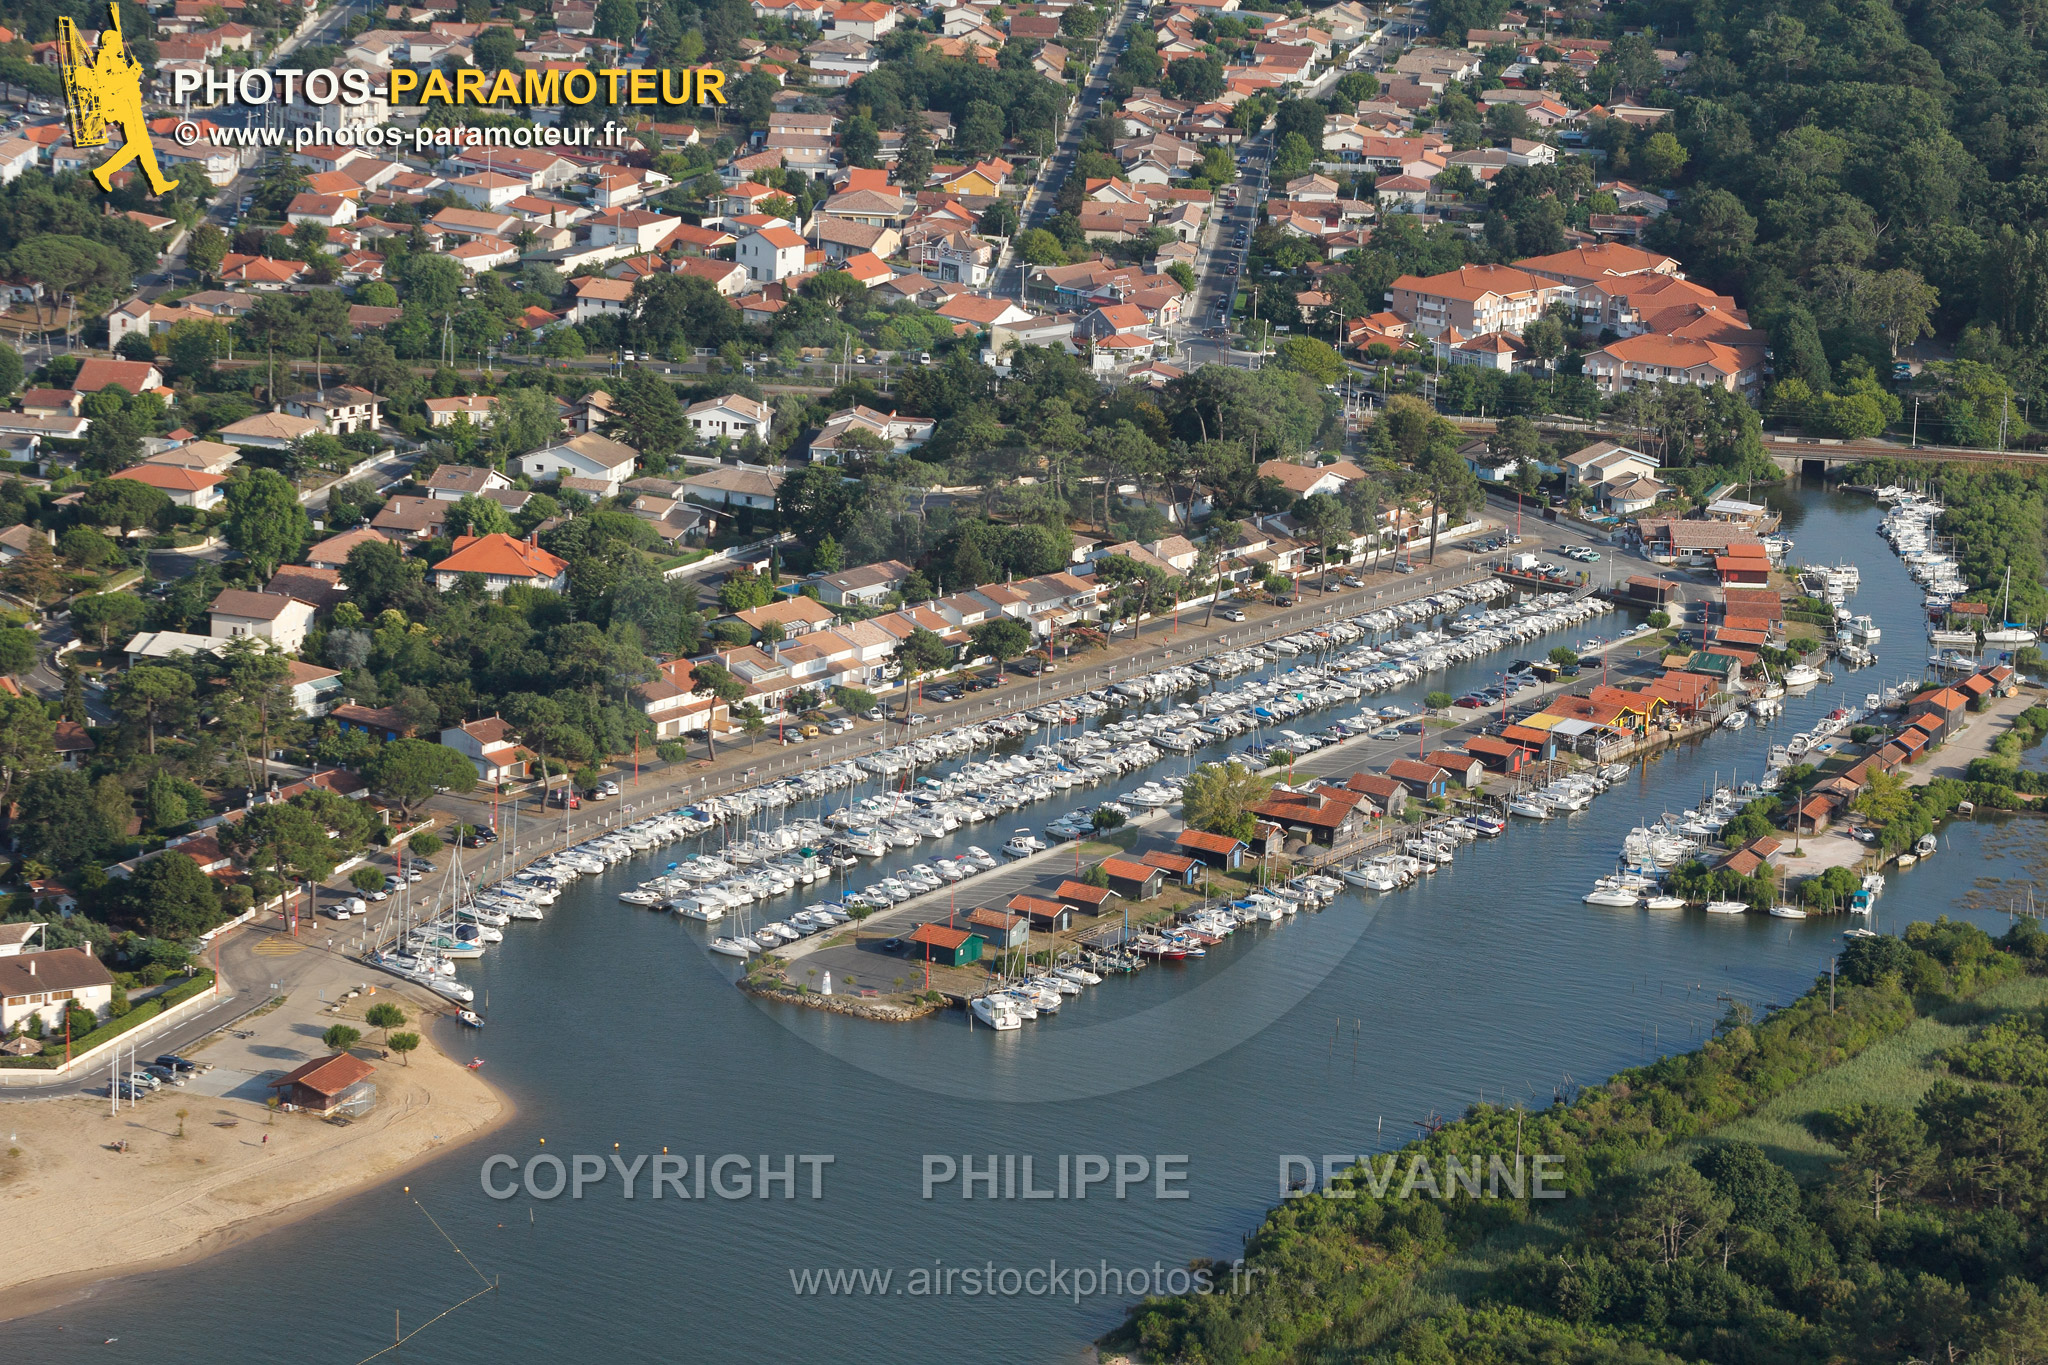 Port de la Hume Gujan-Mestras vue du ciel